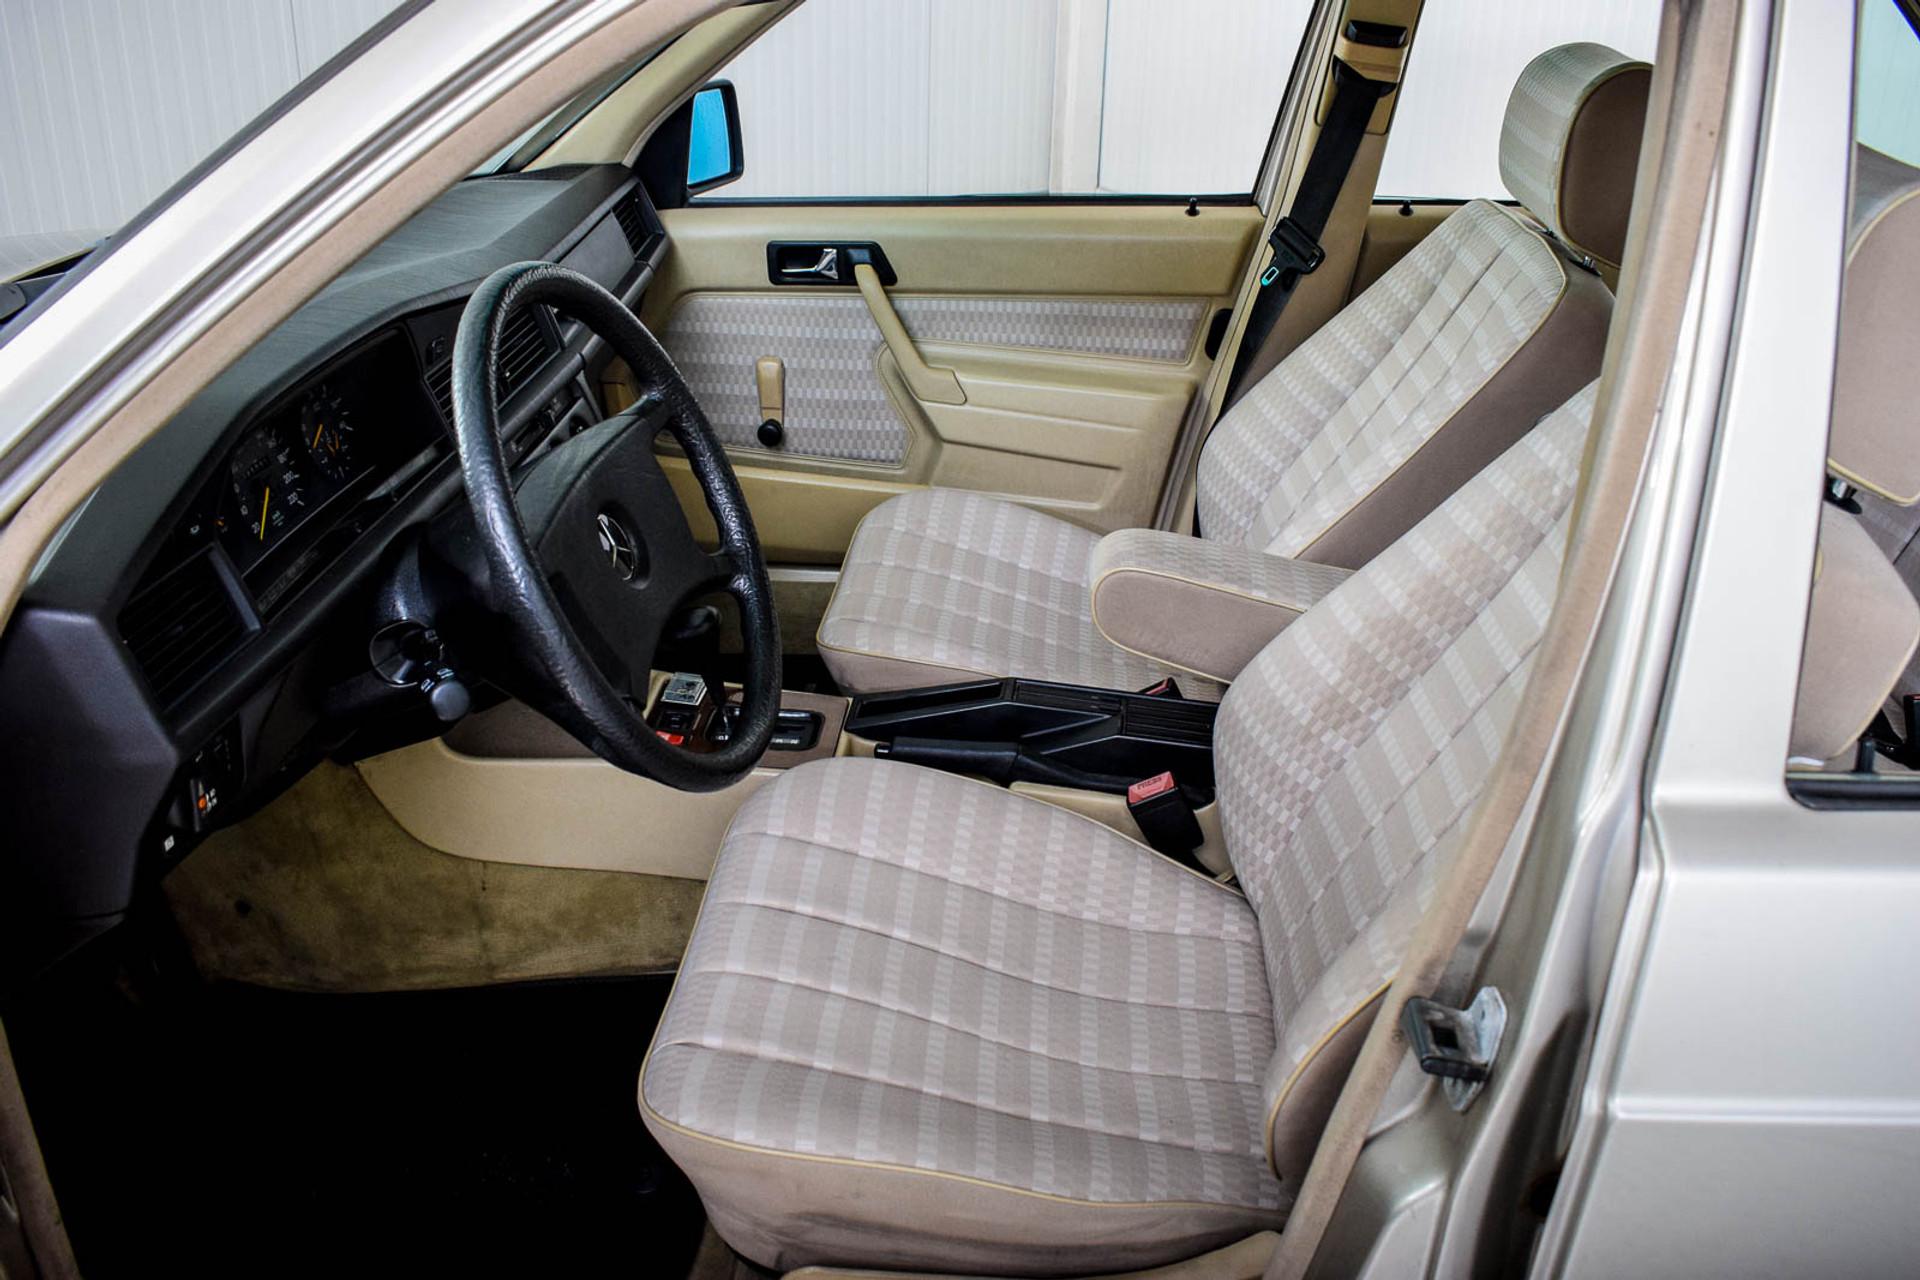 Mercedes-Benz 190 2.5 D Turbo Diesel Foto 5